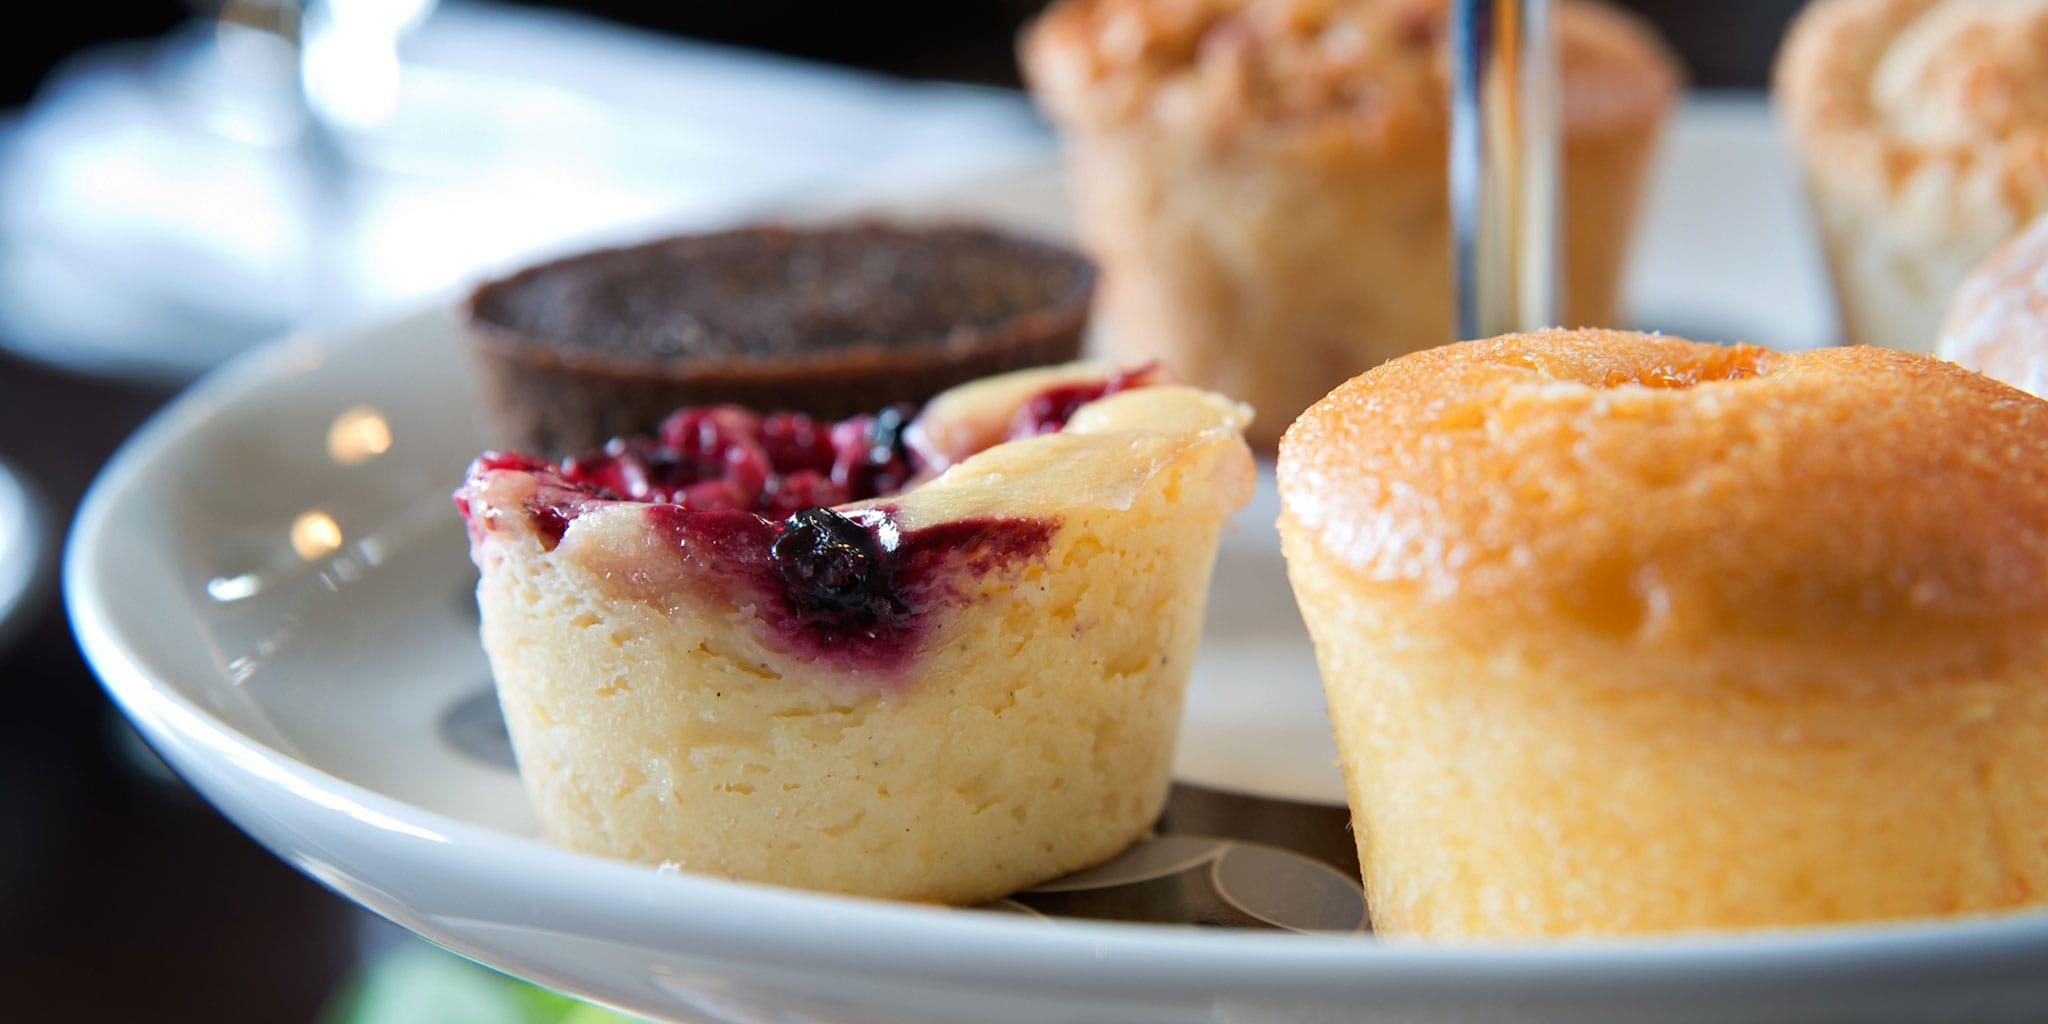 Afternoon-Tea-Cakes-Clayton-Crown-Hotel